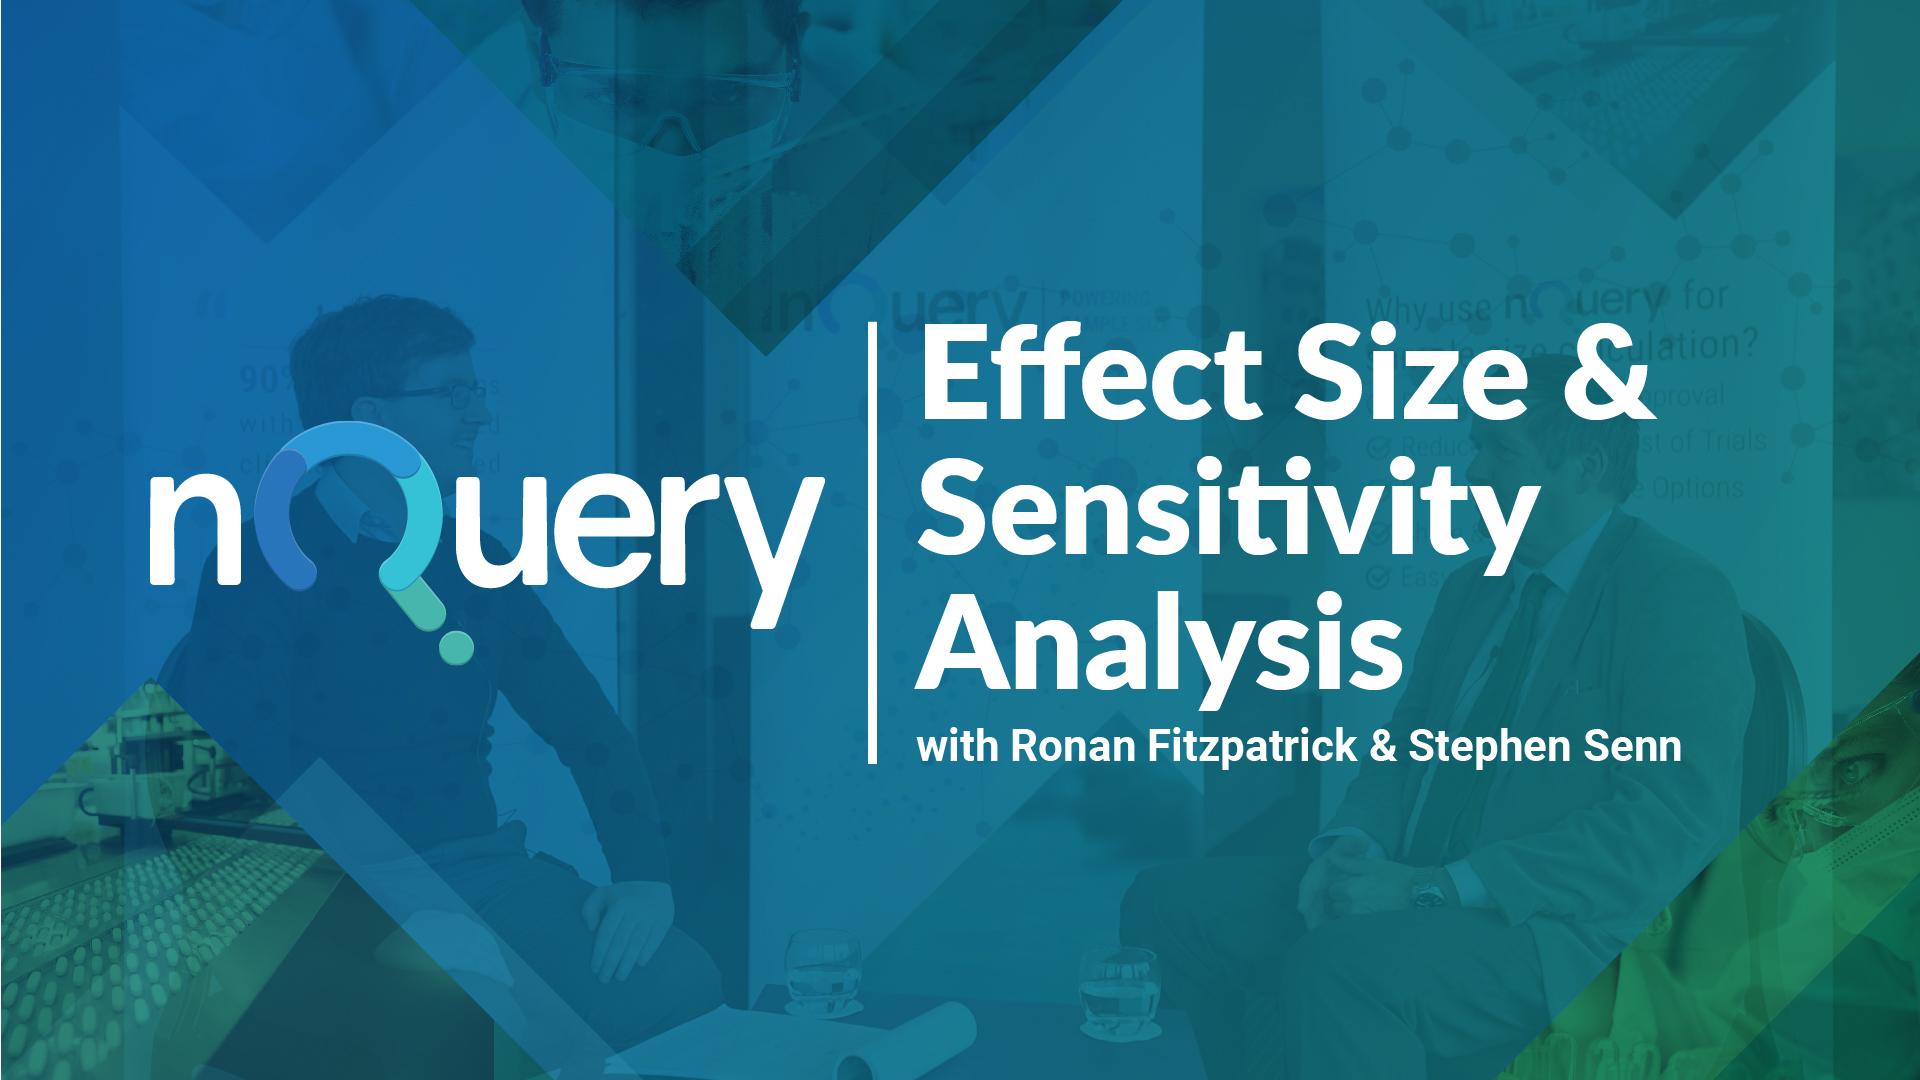 2_selectEffectSizeAndSensitivityAnalysis_2